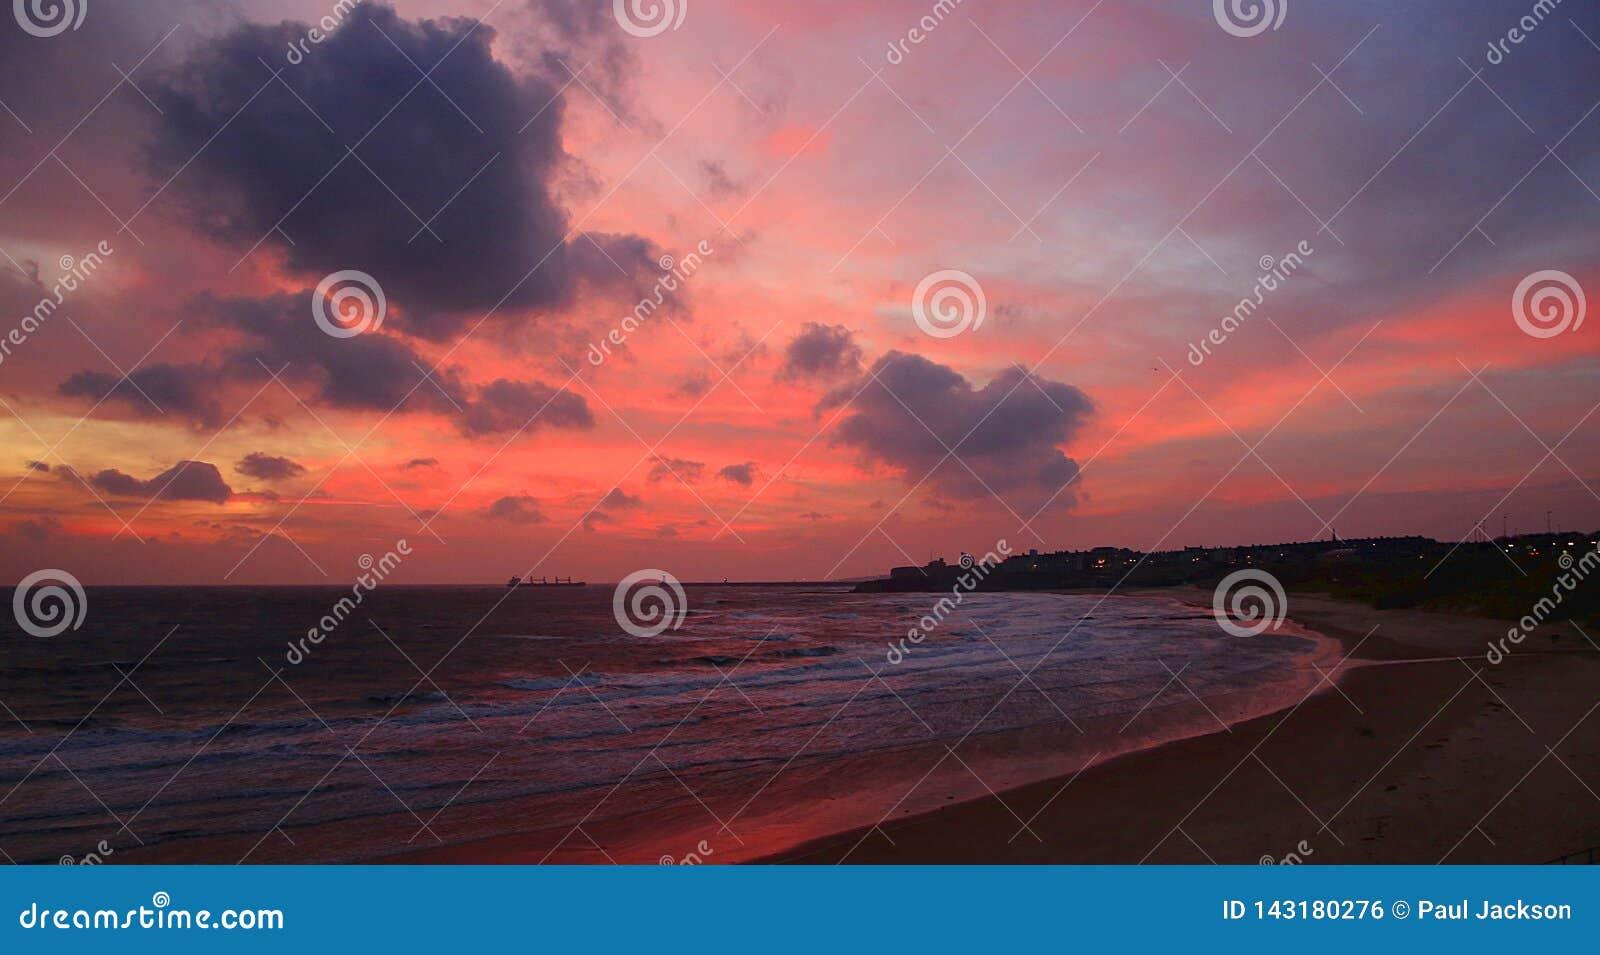 Cloudy, pink sunrise on Tynemouth Longsands beach